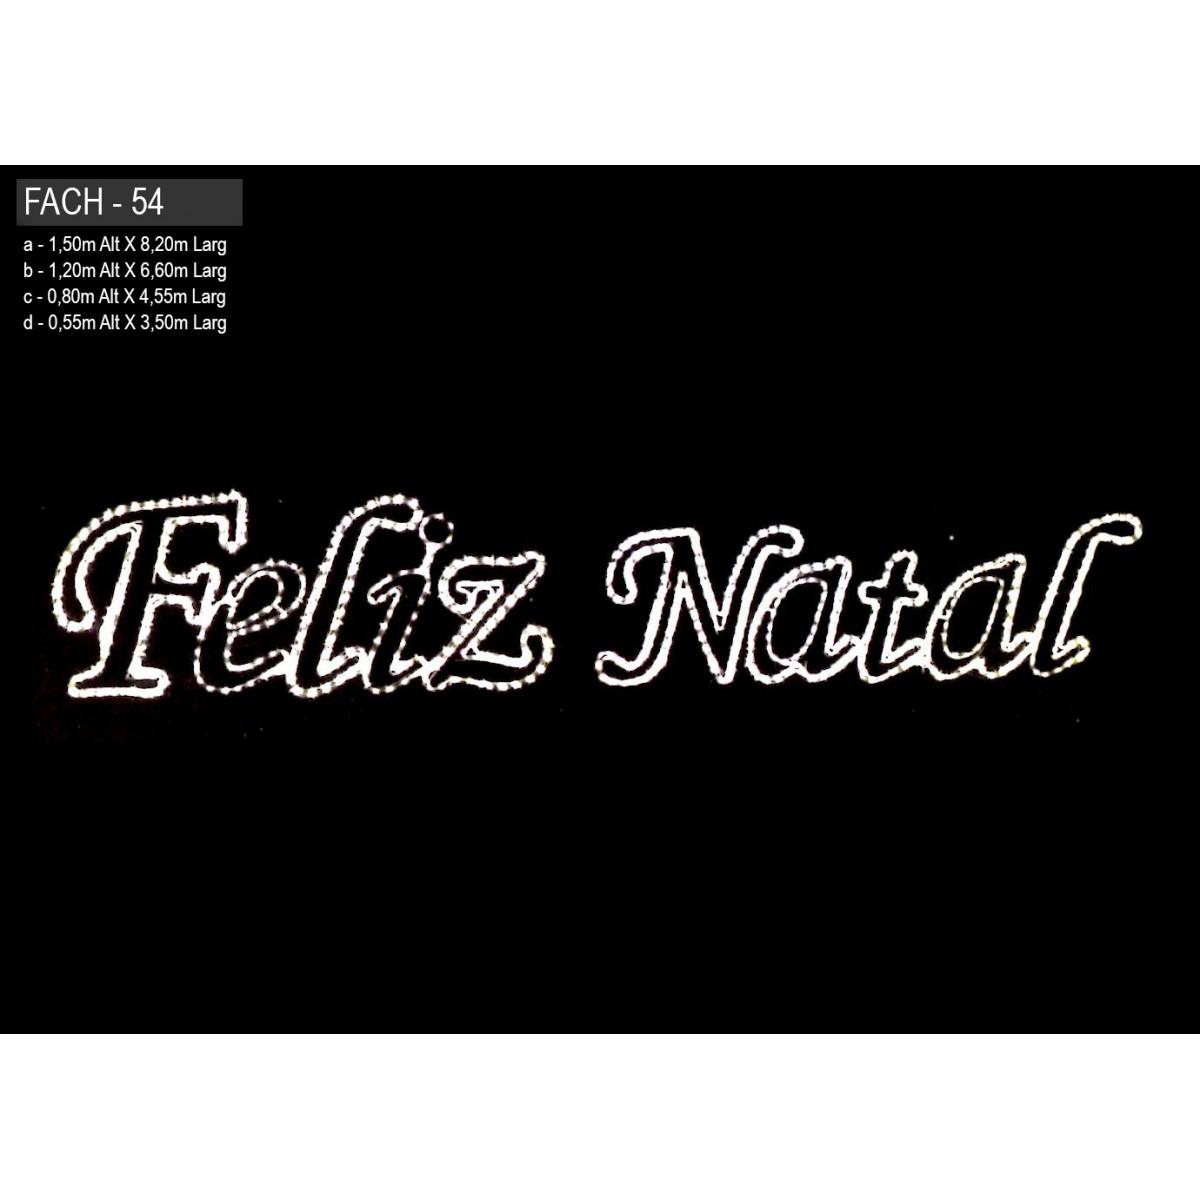 Painel de Natal PN-054/B Iluminado Led - Feliz Natal - MED 1,20 x 6,60 mts